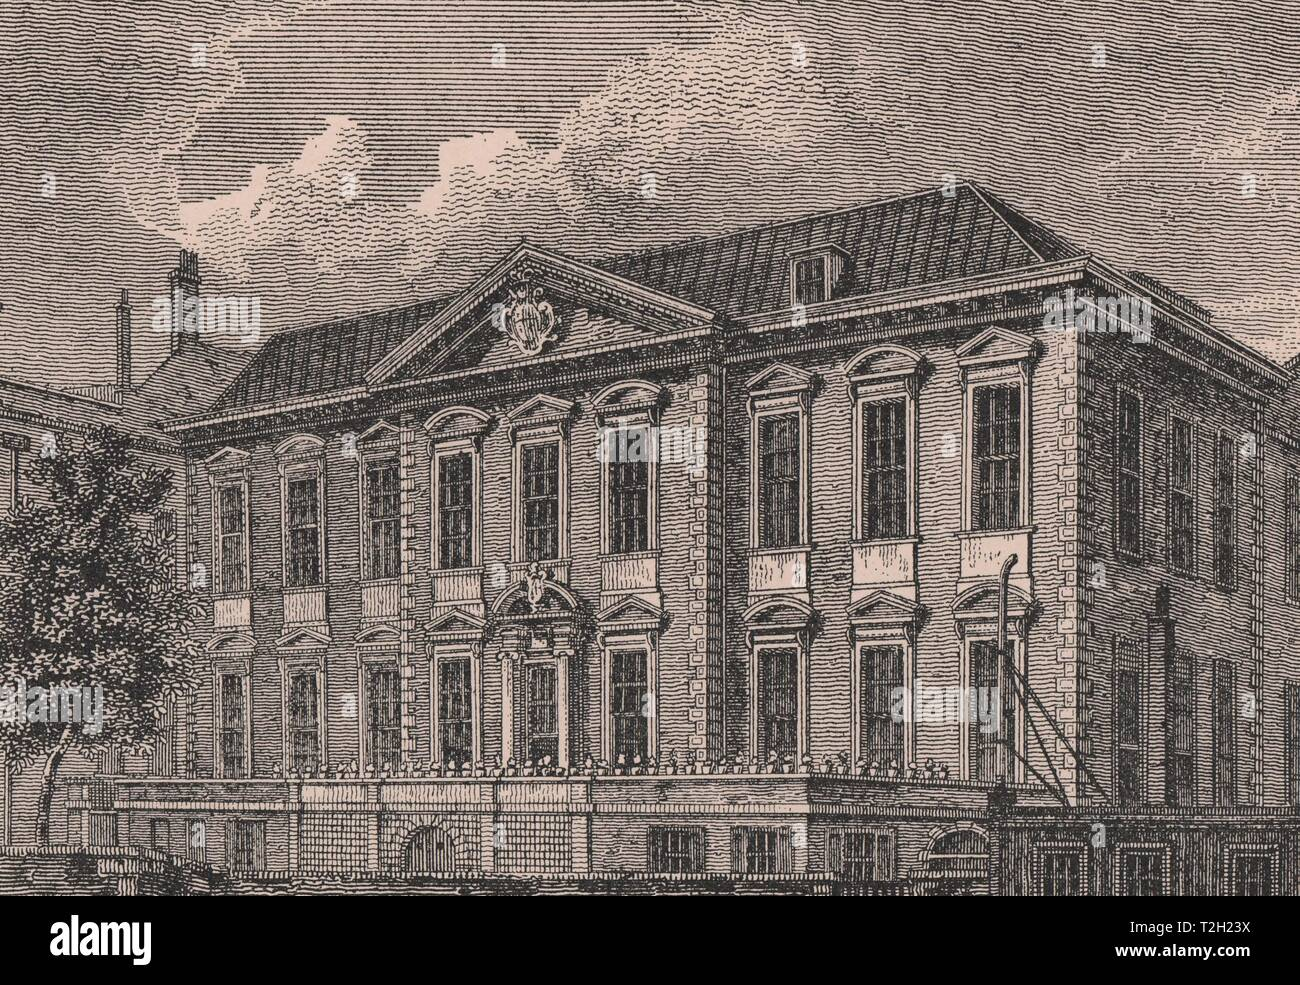 Fishmongers Hall in 1811 - Stock Image